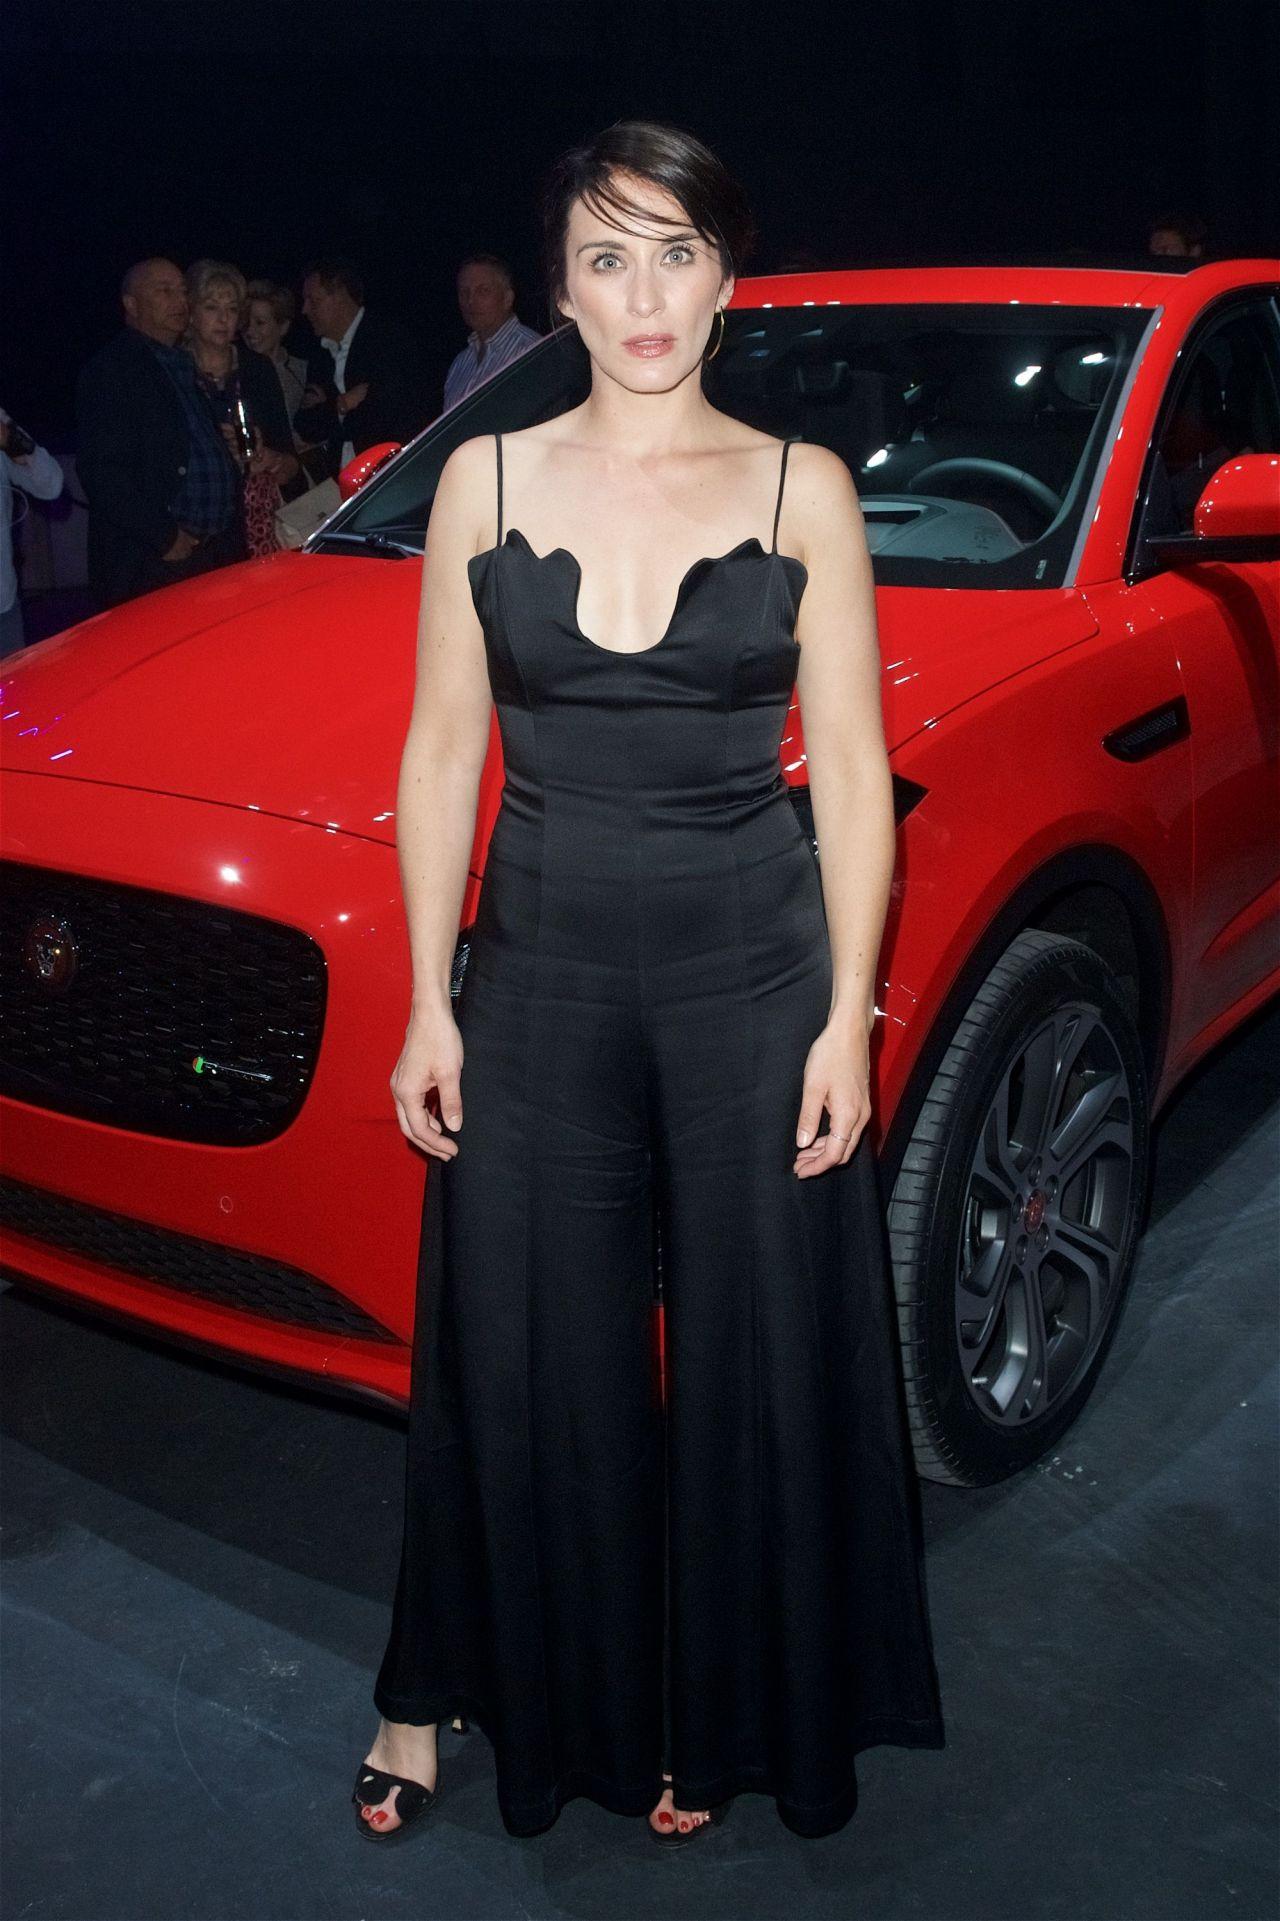 Vicky Mcclure Jaguar E Pace Car Launch Party In London